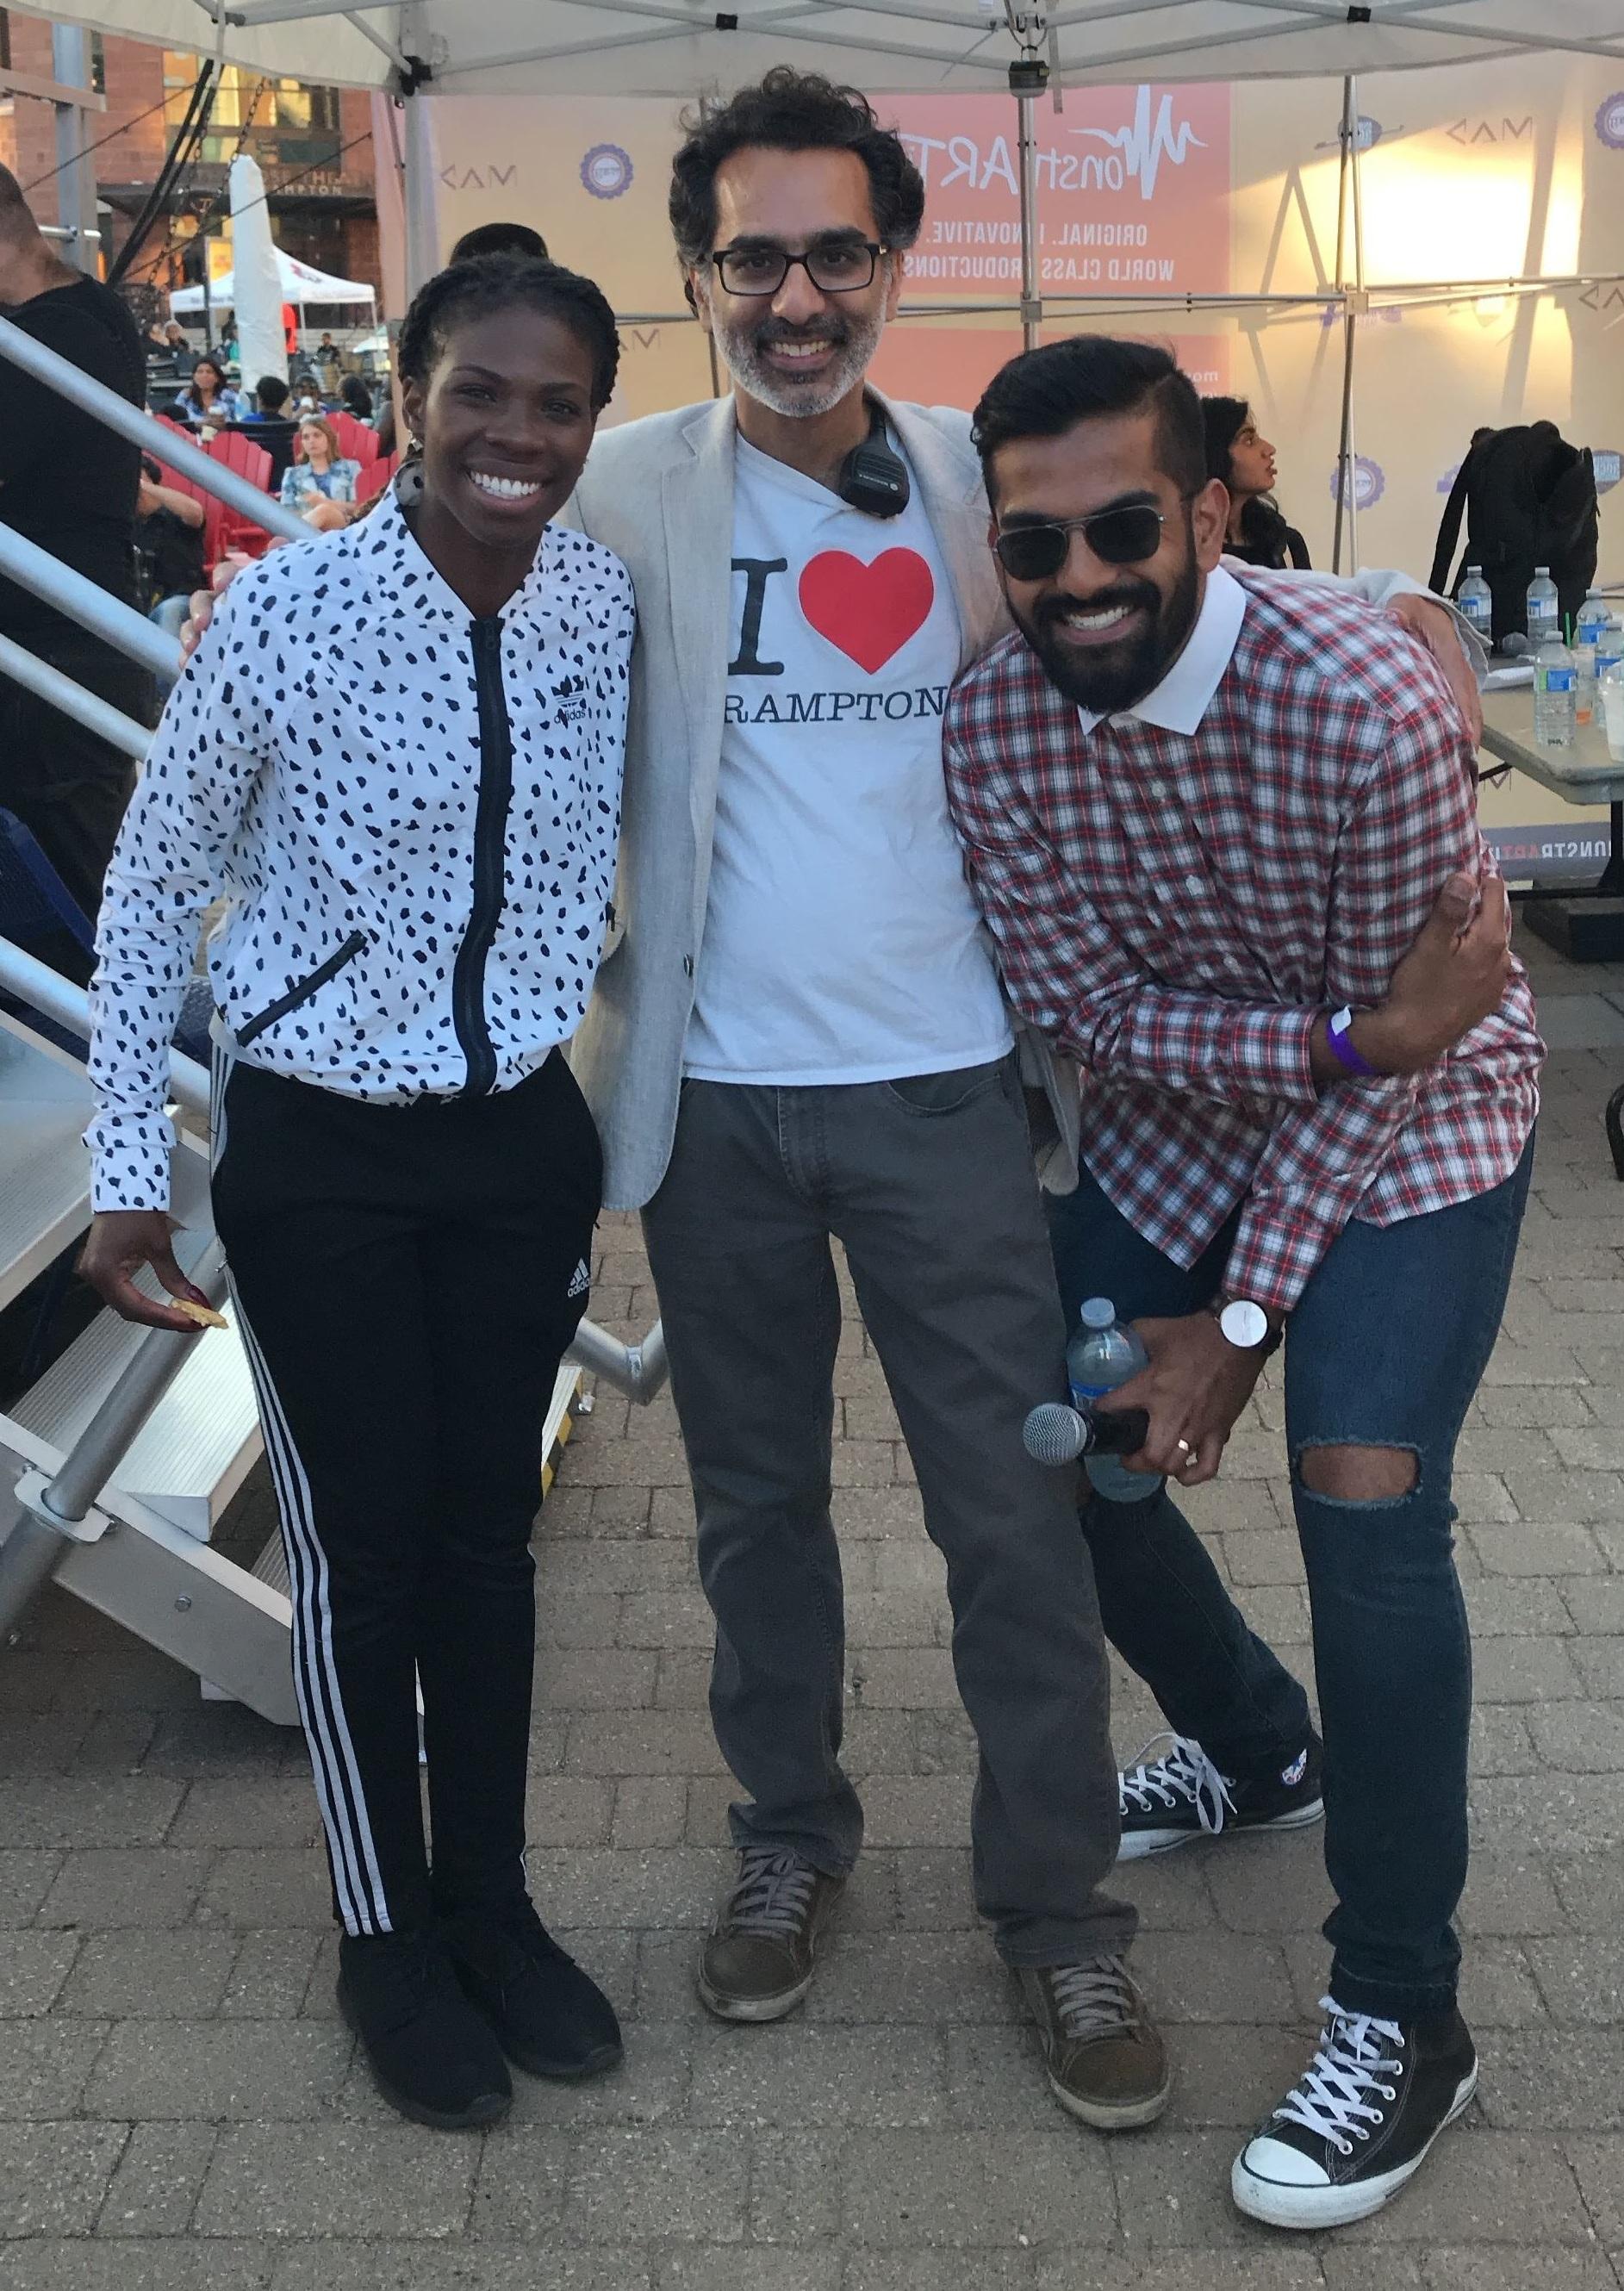 (From Left to Right) Rapper Haviah Mighty, Monstrartity Creative Director Vikas Kohli and Nav Nanwa